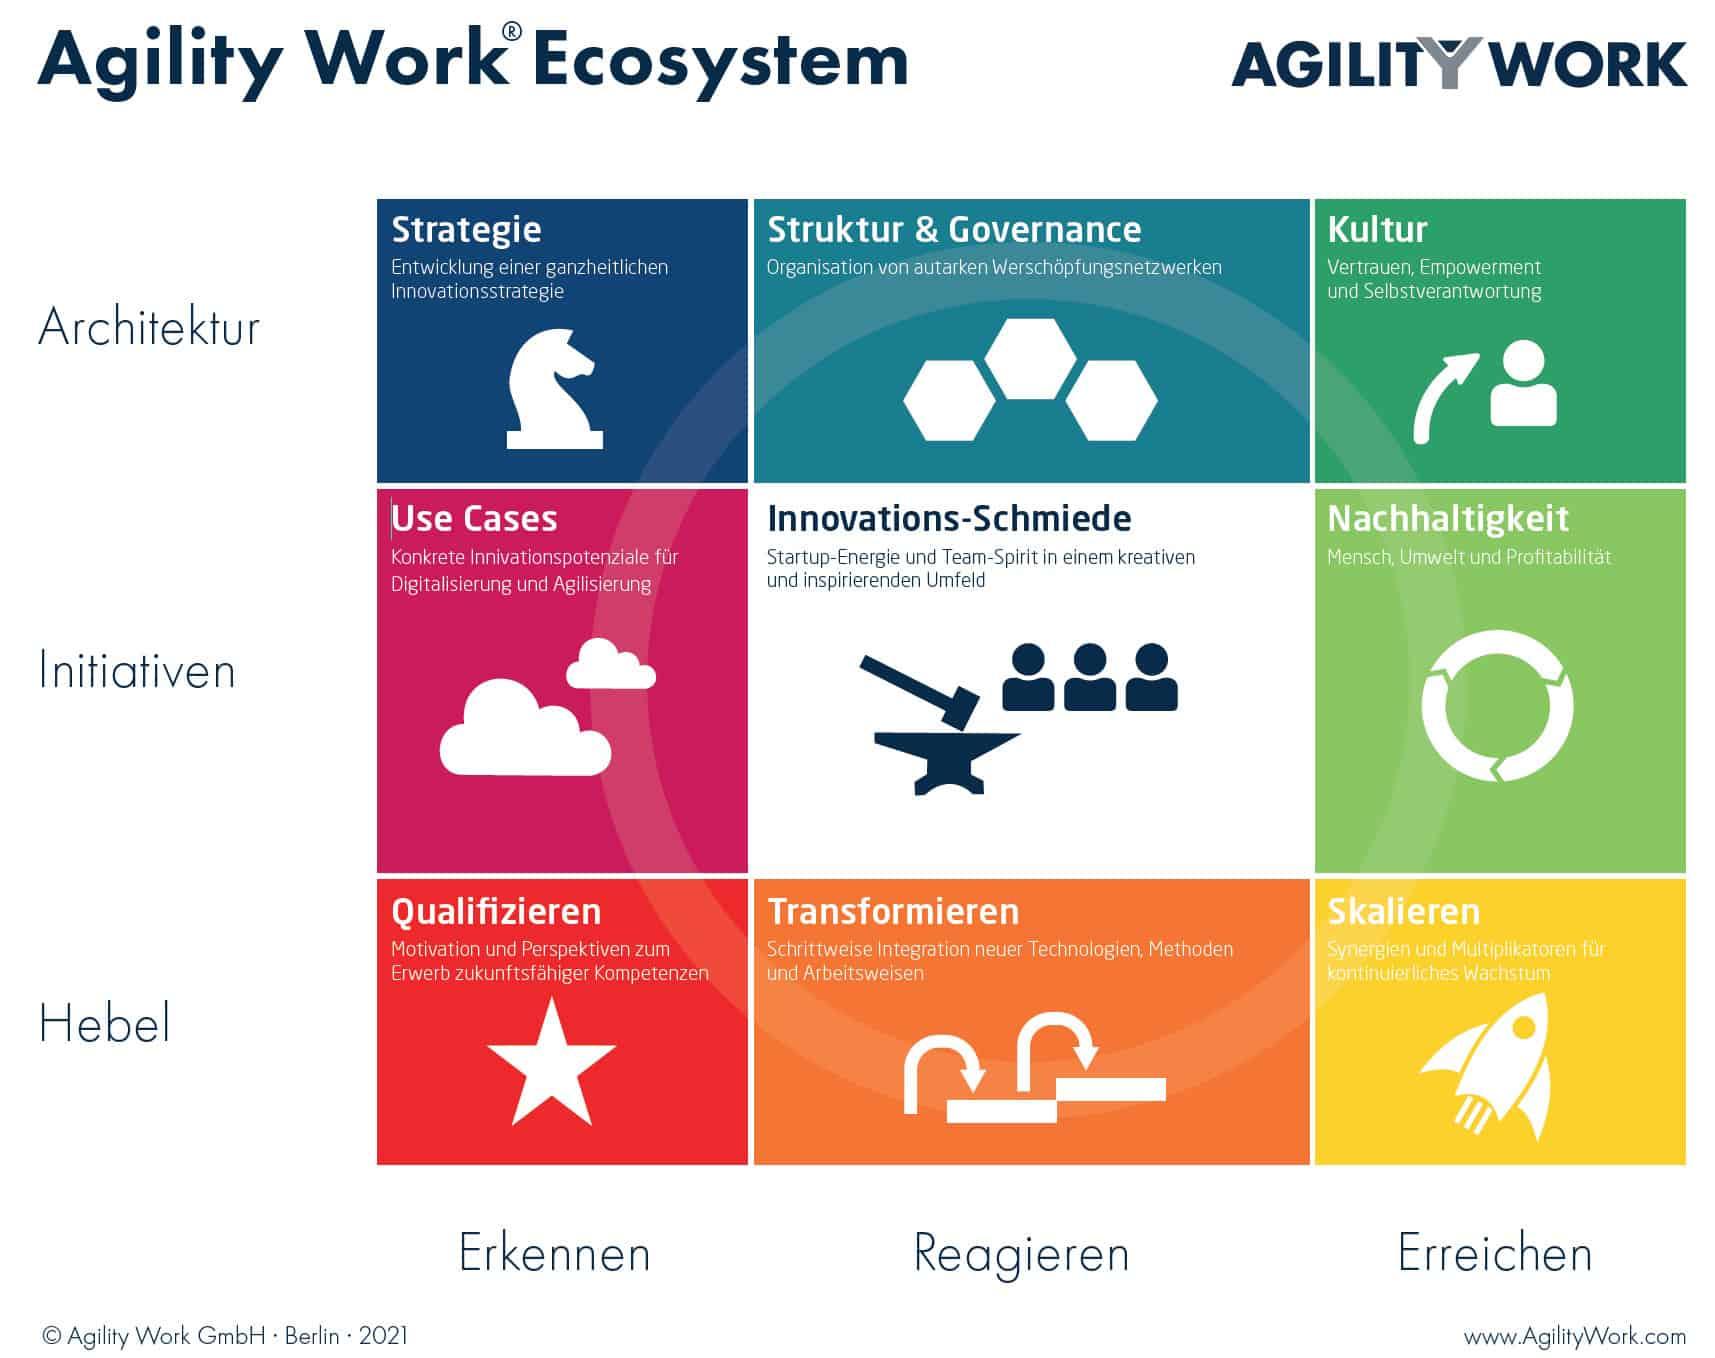 Agility Work® Ecosystem